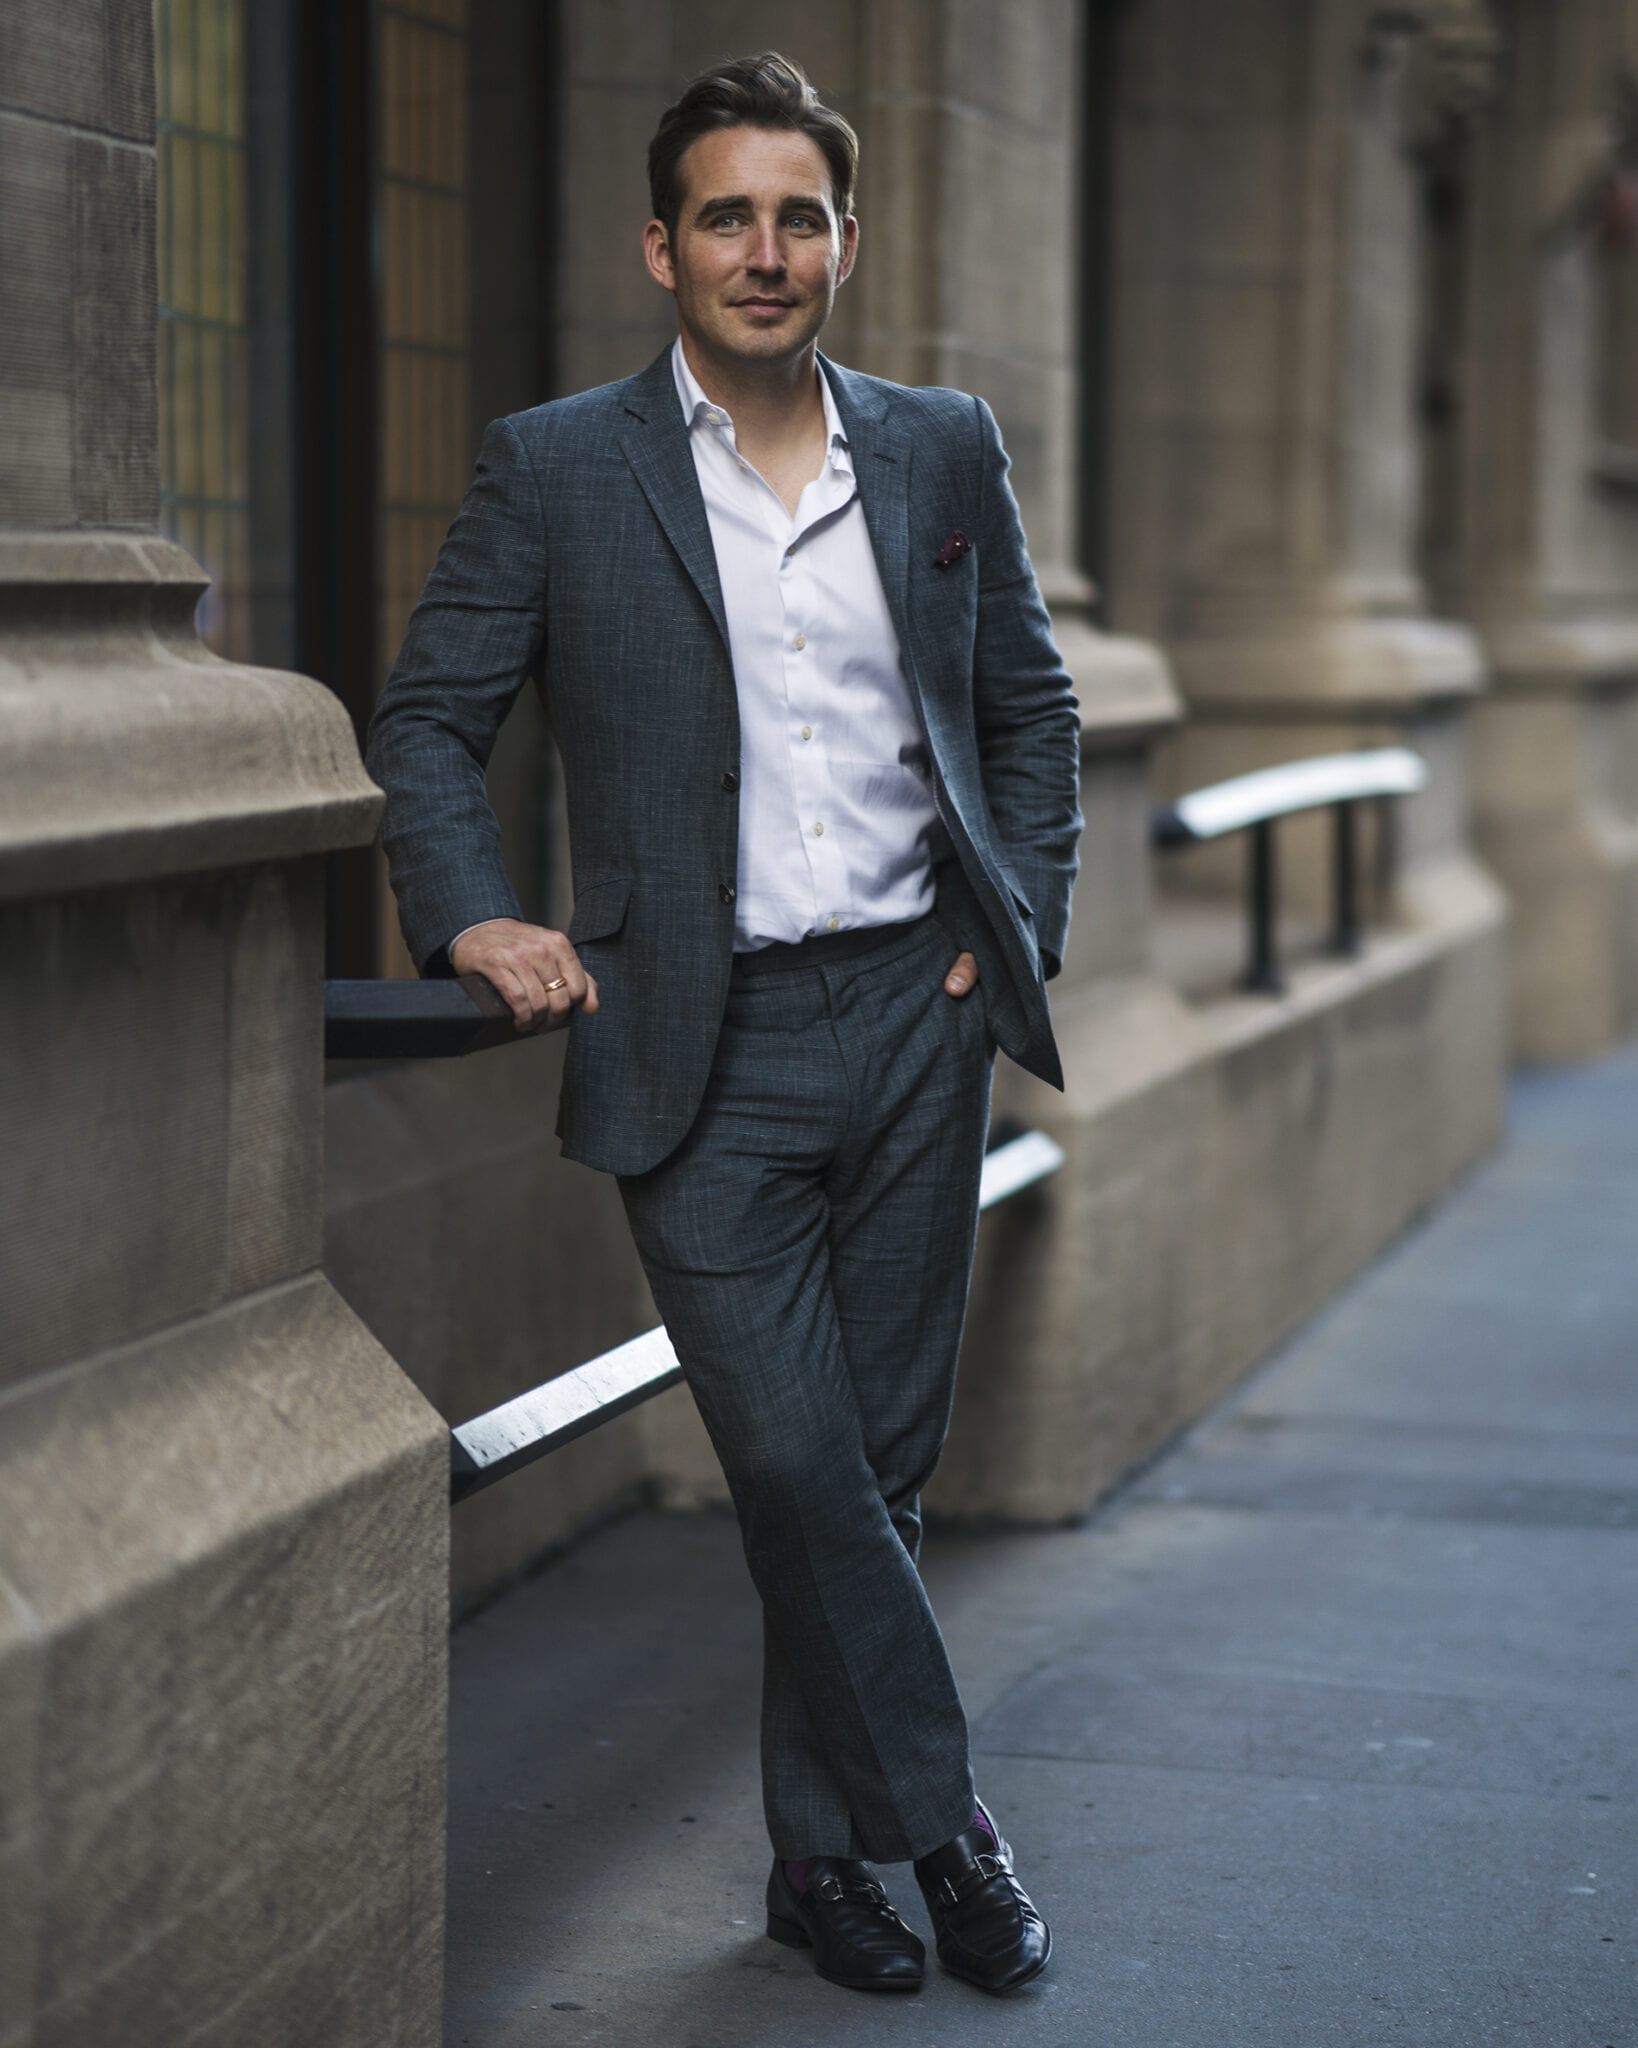 Author Phil M Jones standing in a street